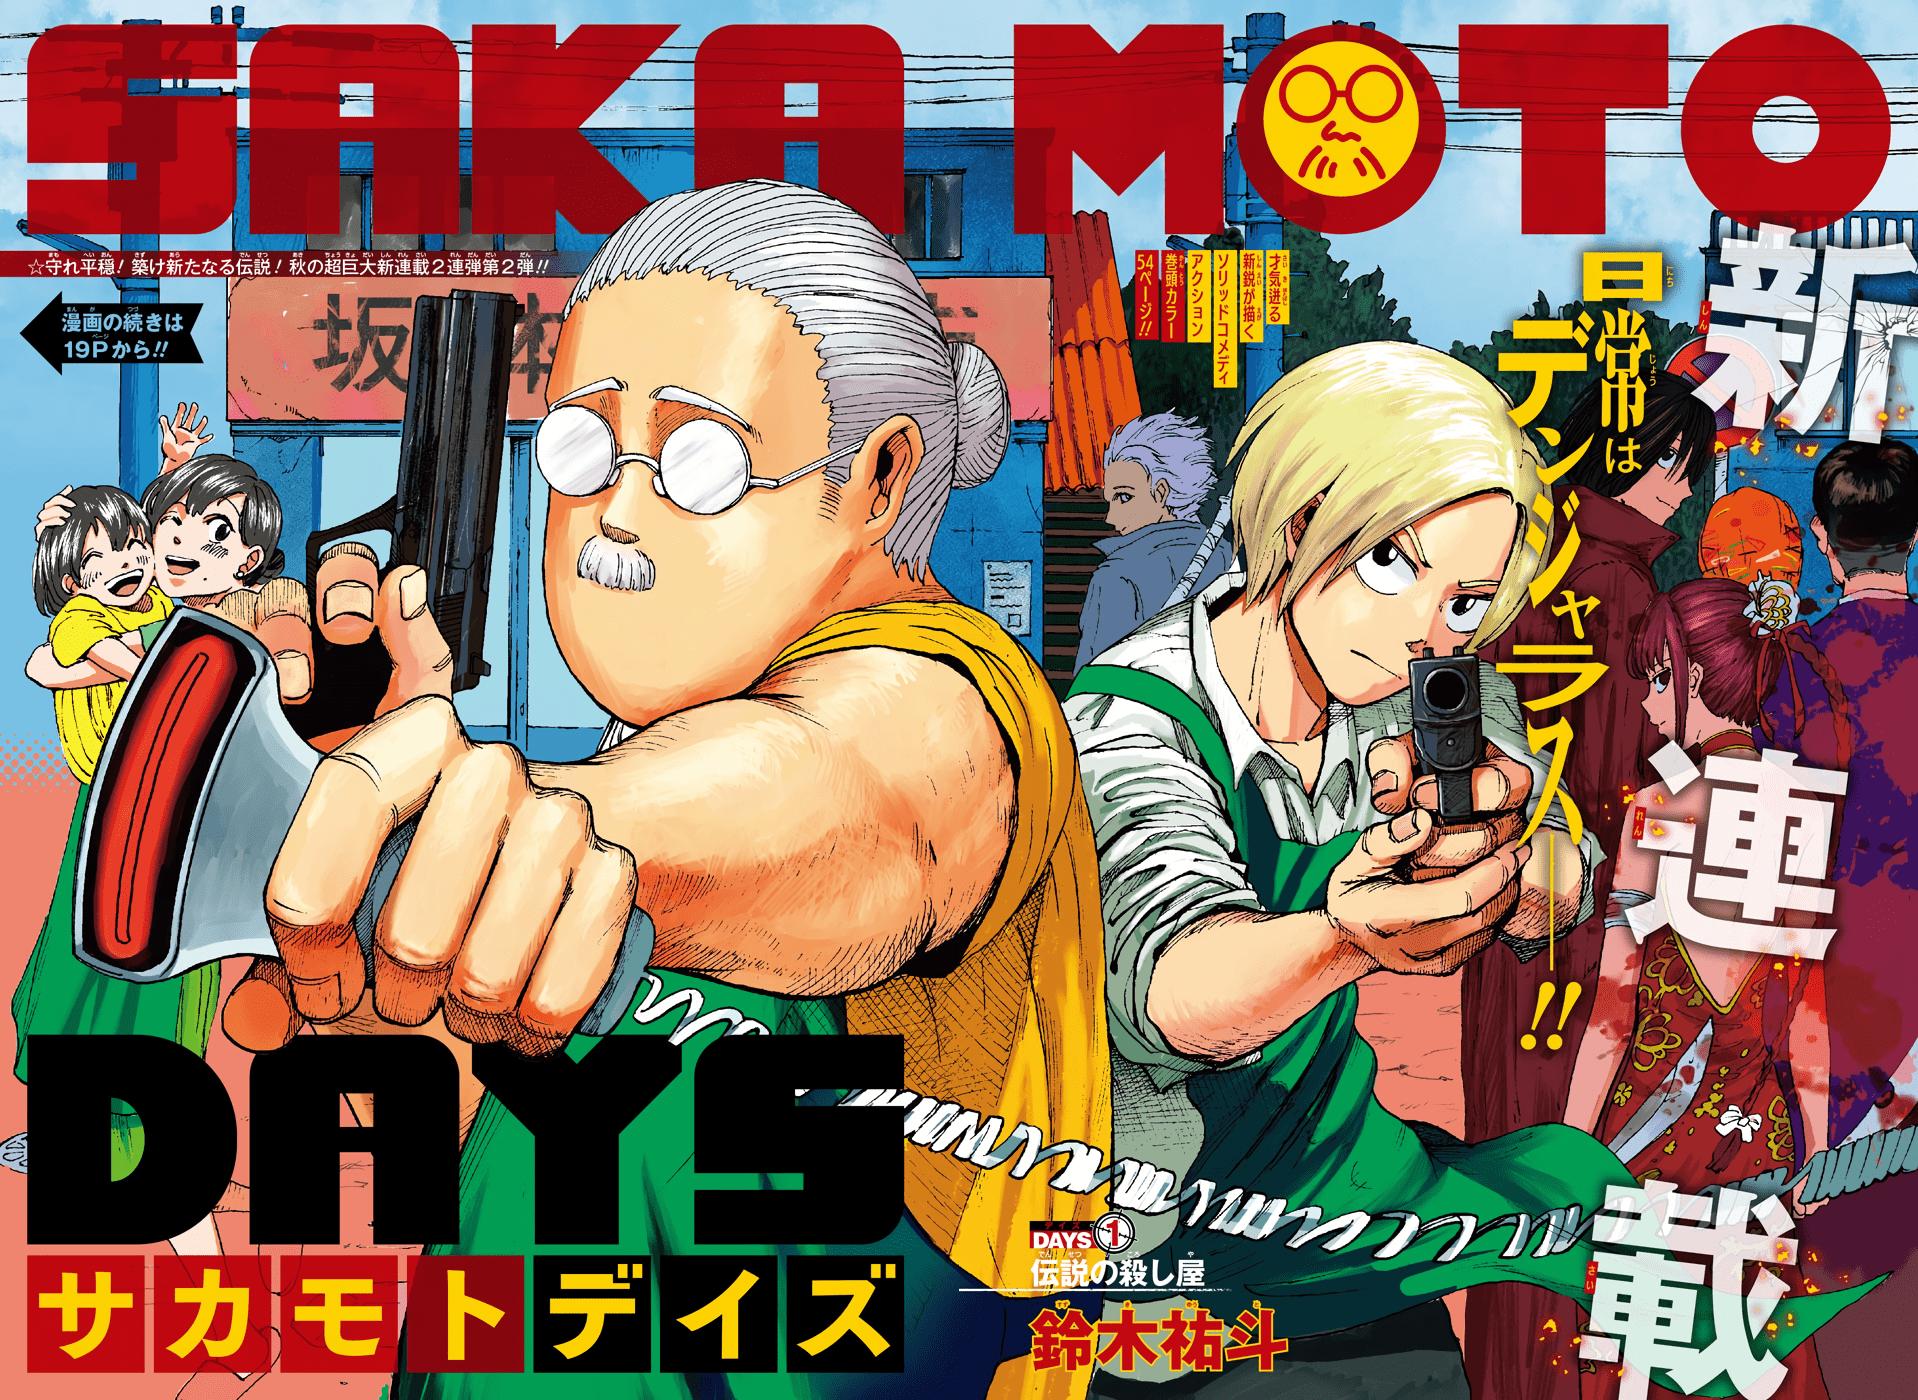 sakamoto-days-shin-and-taro